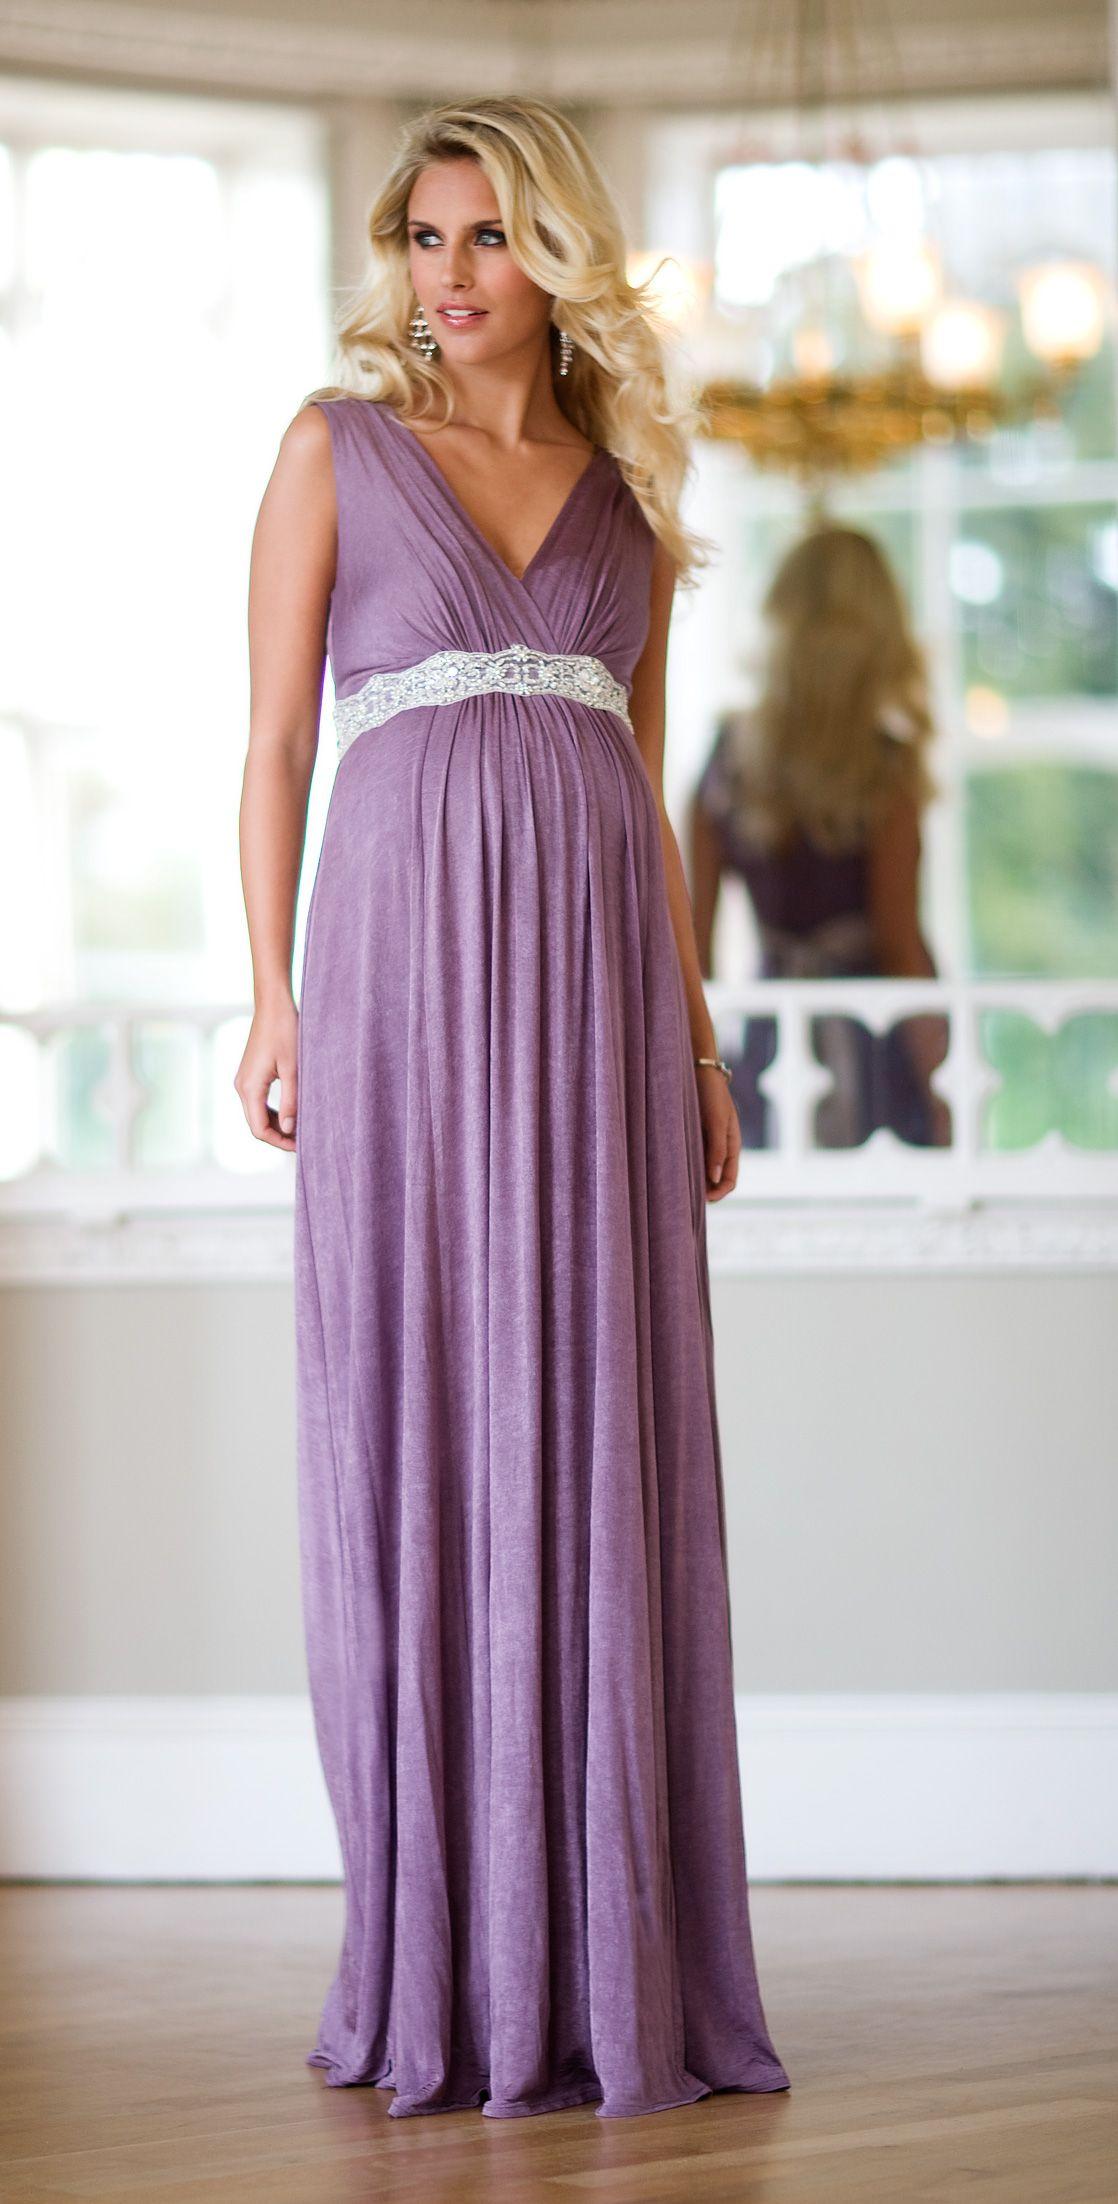 Anastasia Maternity Gown (Heather) with Diamante Sash by Tiffany ...